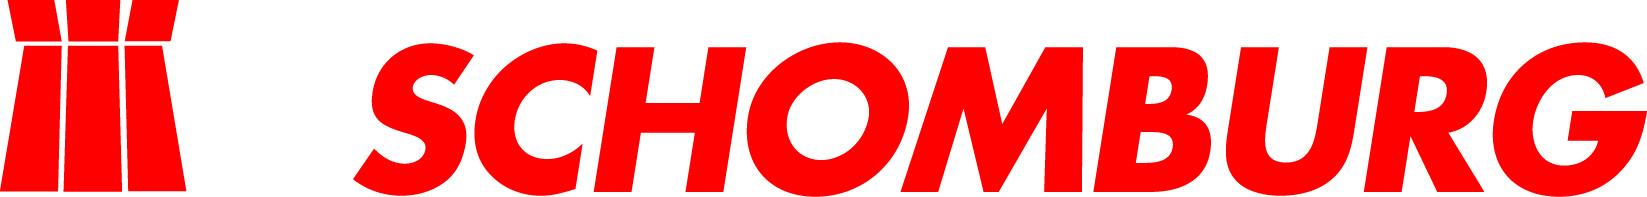 043_SCHOMBURG_GmbH&Co.KG_logo